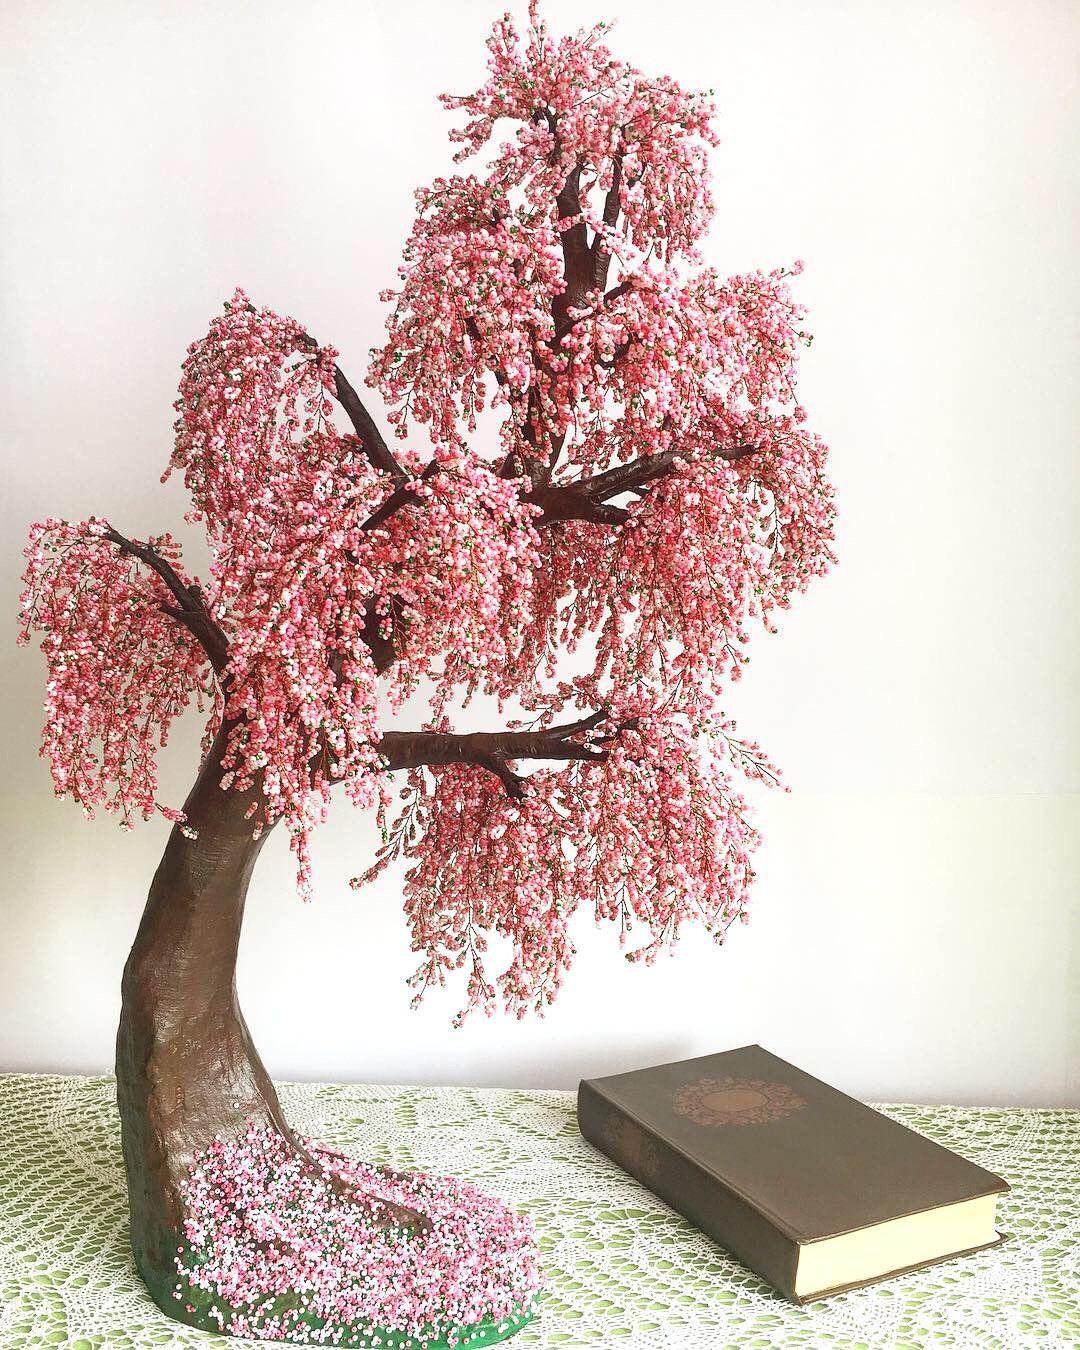 20 Stunning Bonsai Plant Design Ideas For Garden Trenduhome Bonsai Tree Bonsai Plants Bonsai